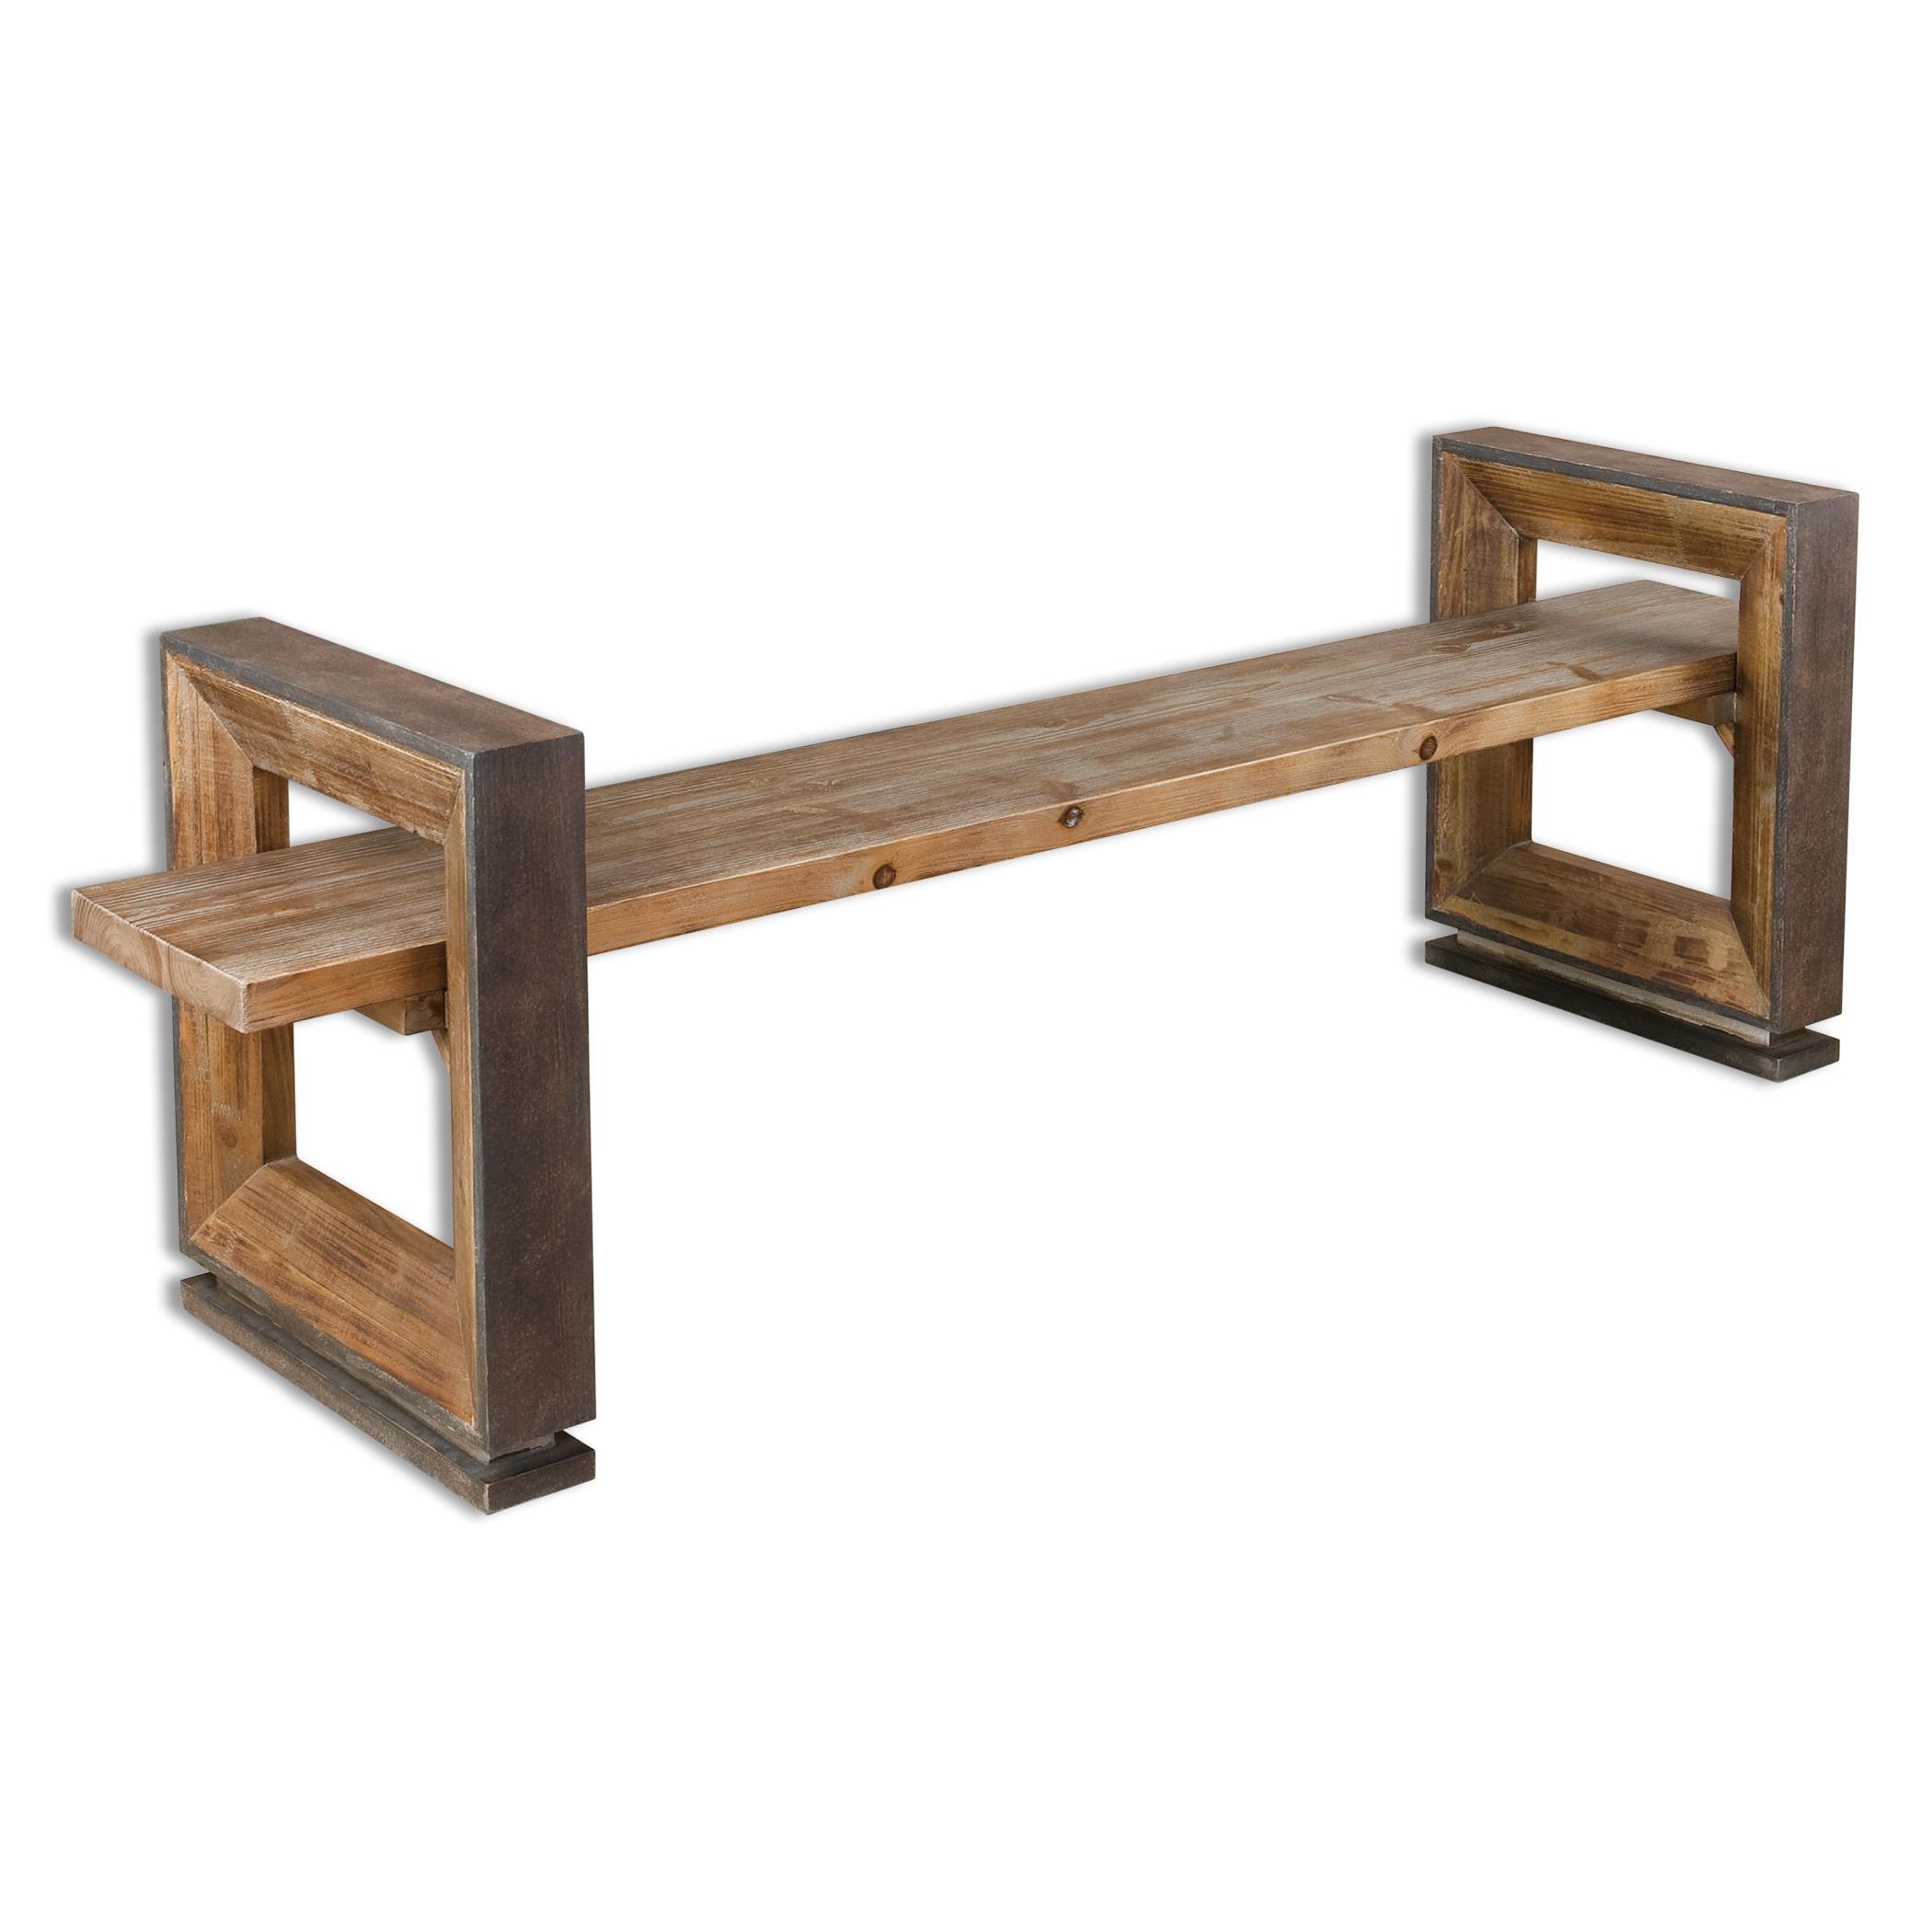 Uttermost Accent Furniture Parkyn Modern Bench - Item Number: 24512